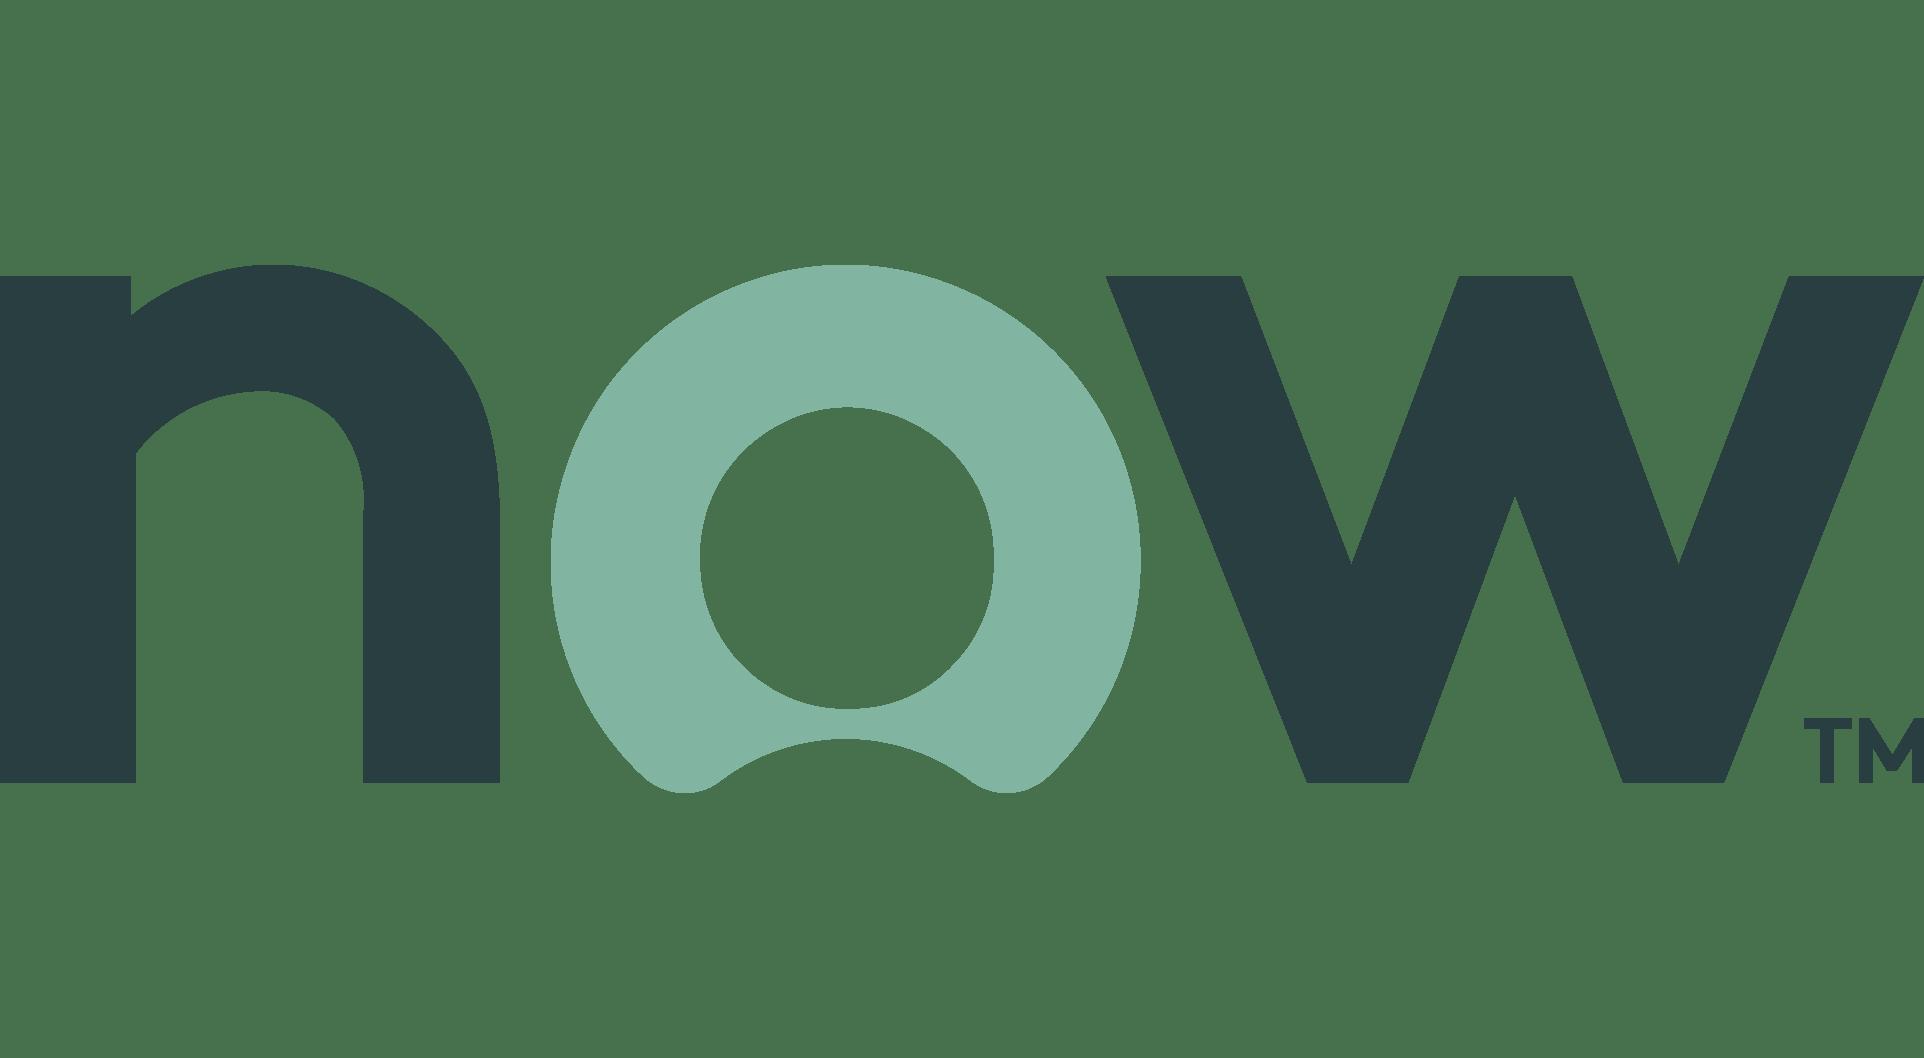 Accruent Expands Healthcare Platform to Improve Enterprise Performance Through Workflow Automation and Data-Driven Decision Support